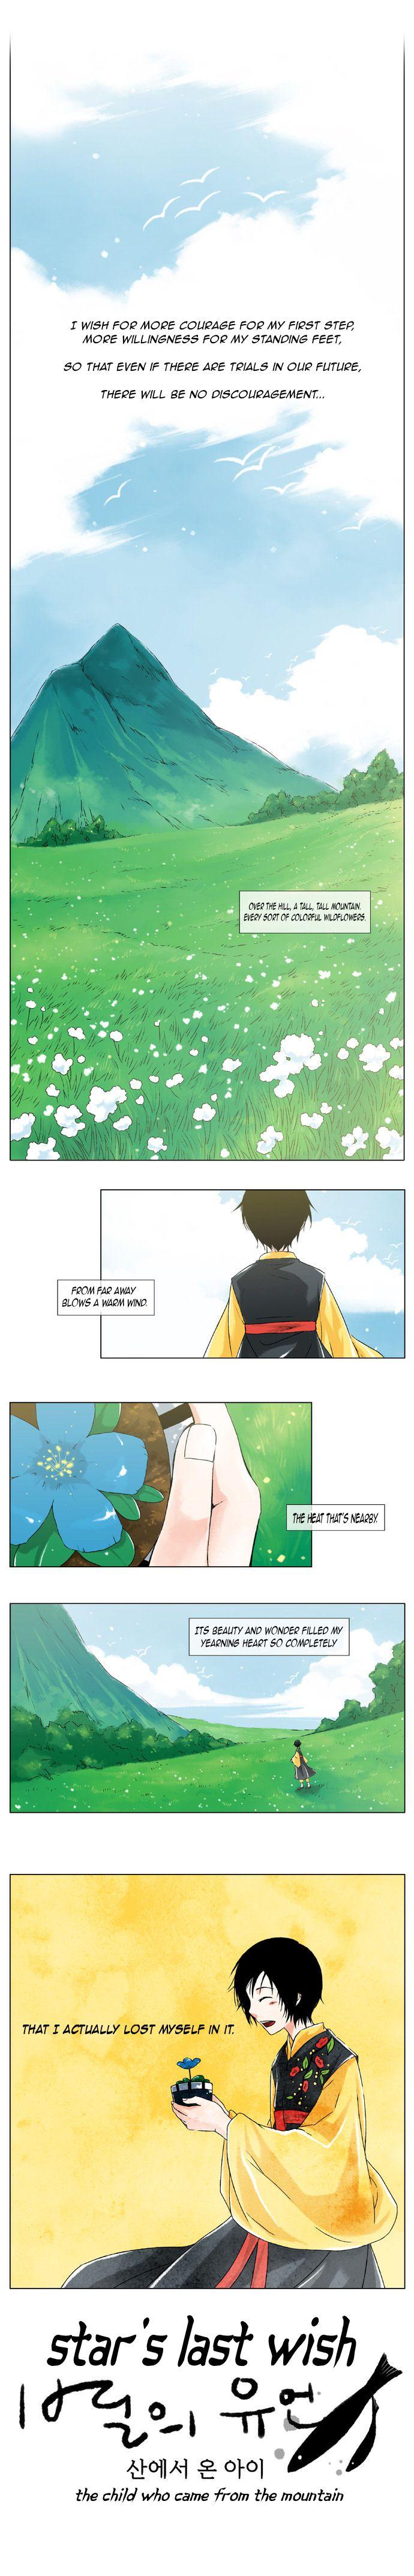 Star's Last Wish 1 Page 2